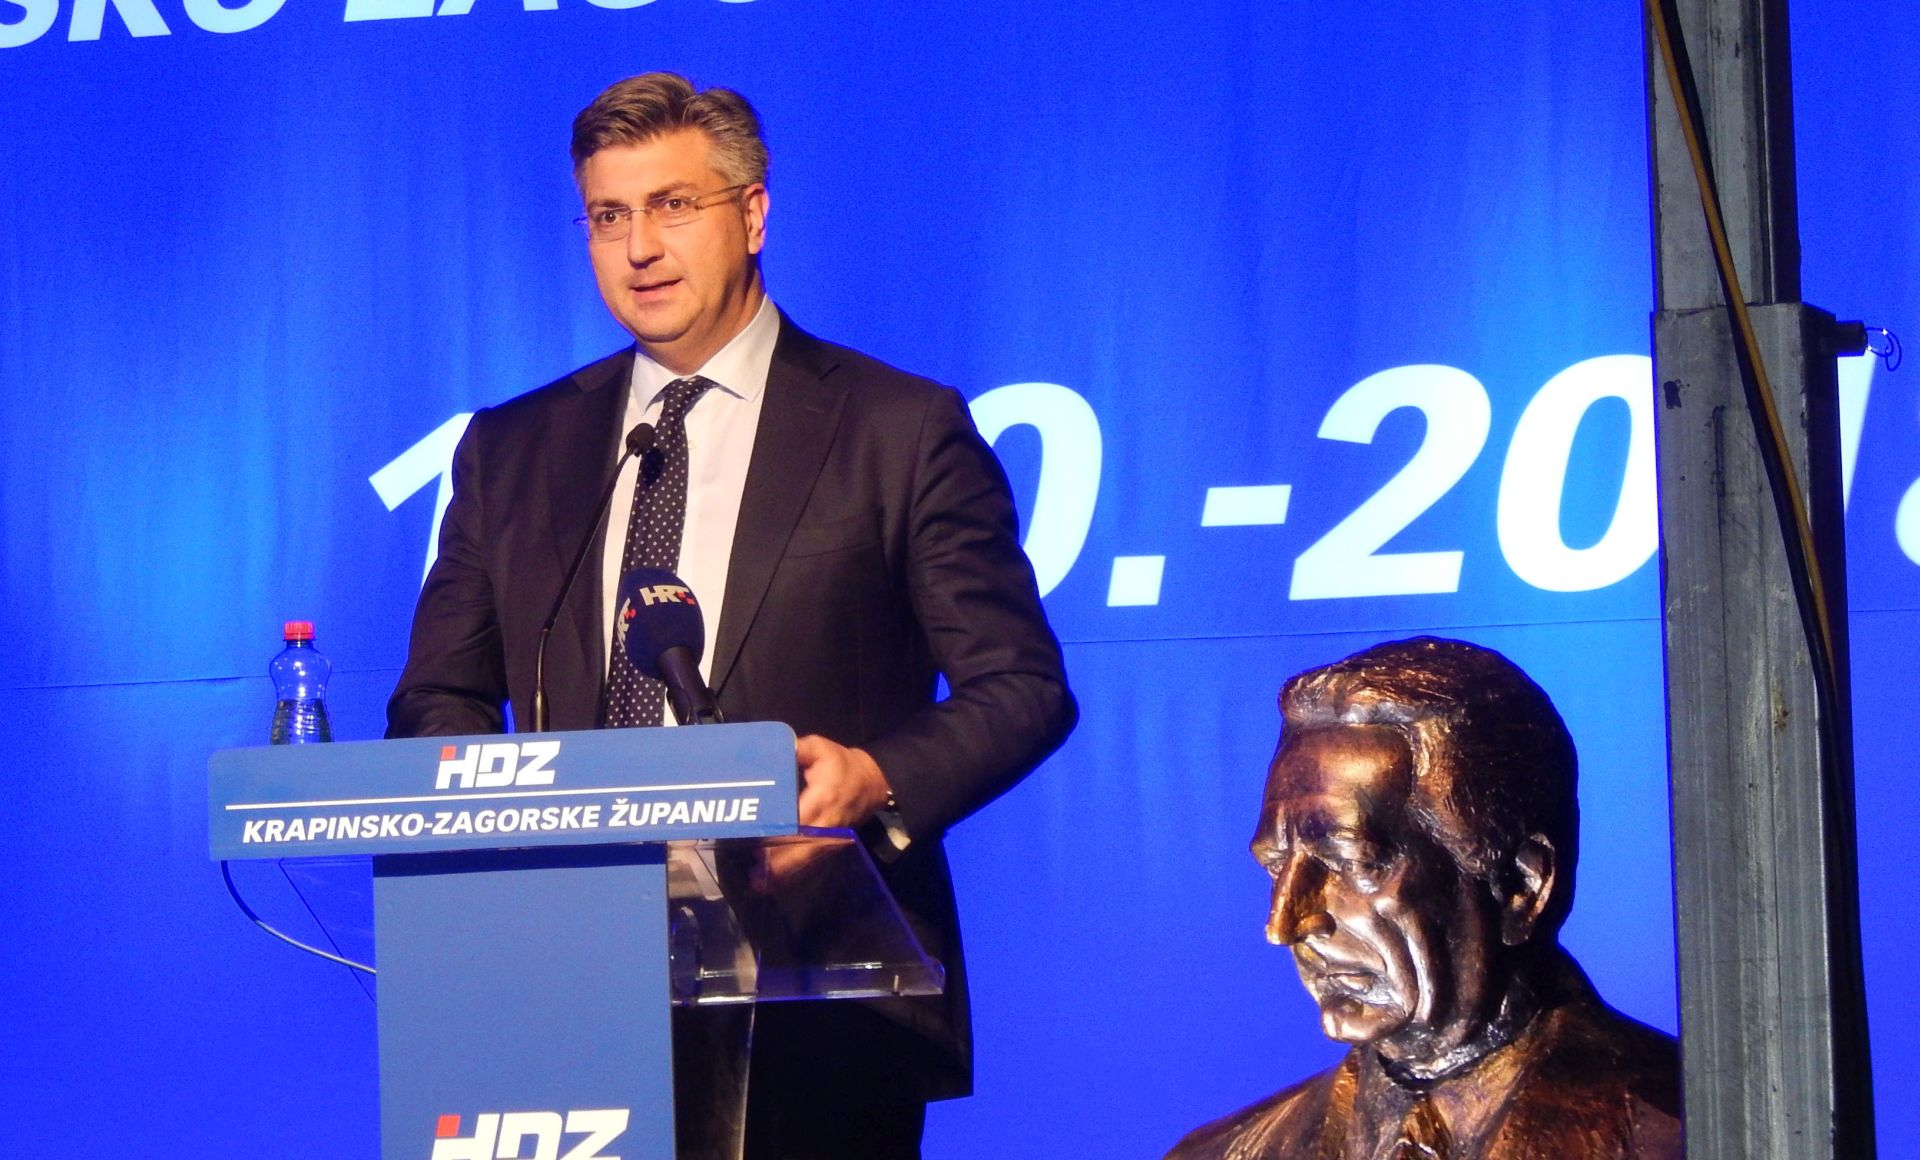 HDZ raste, SDP pada